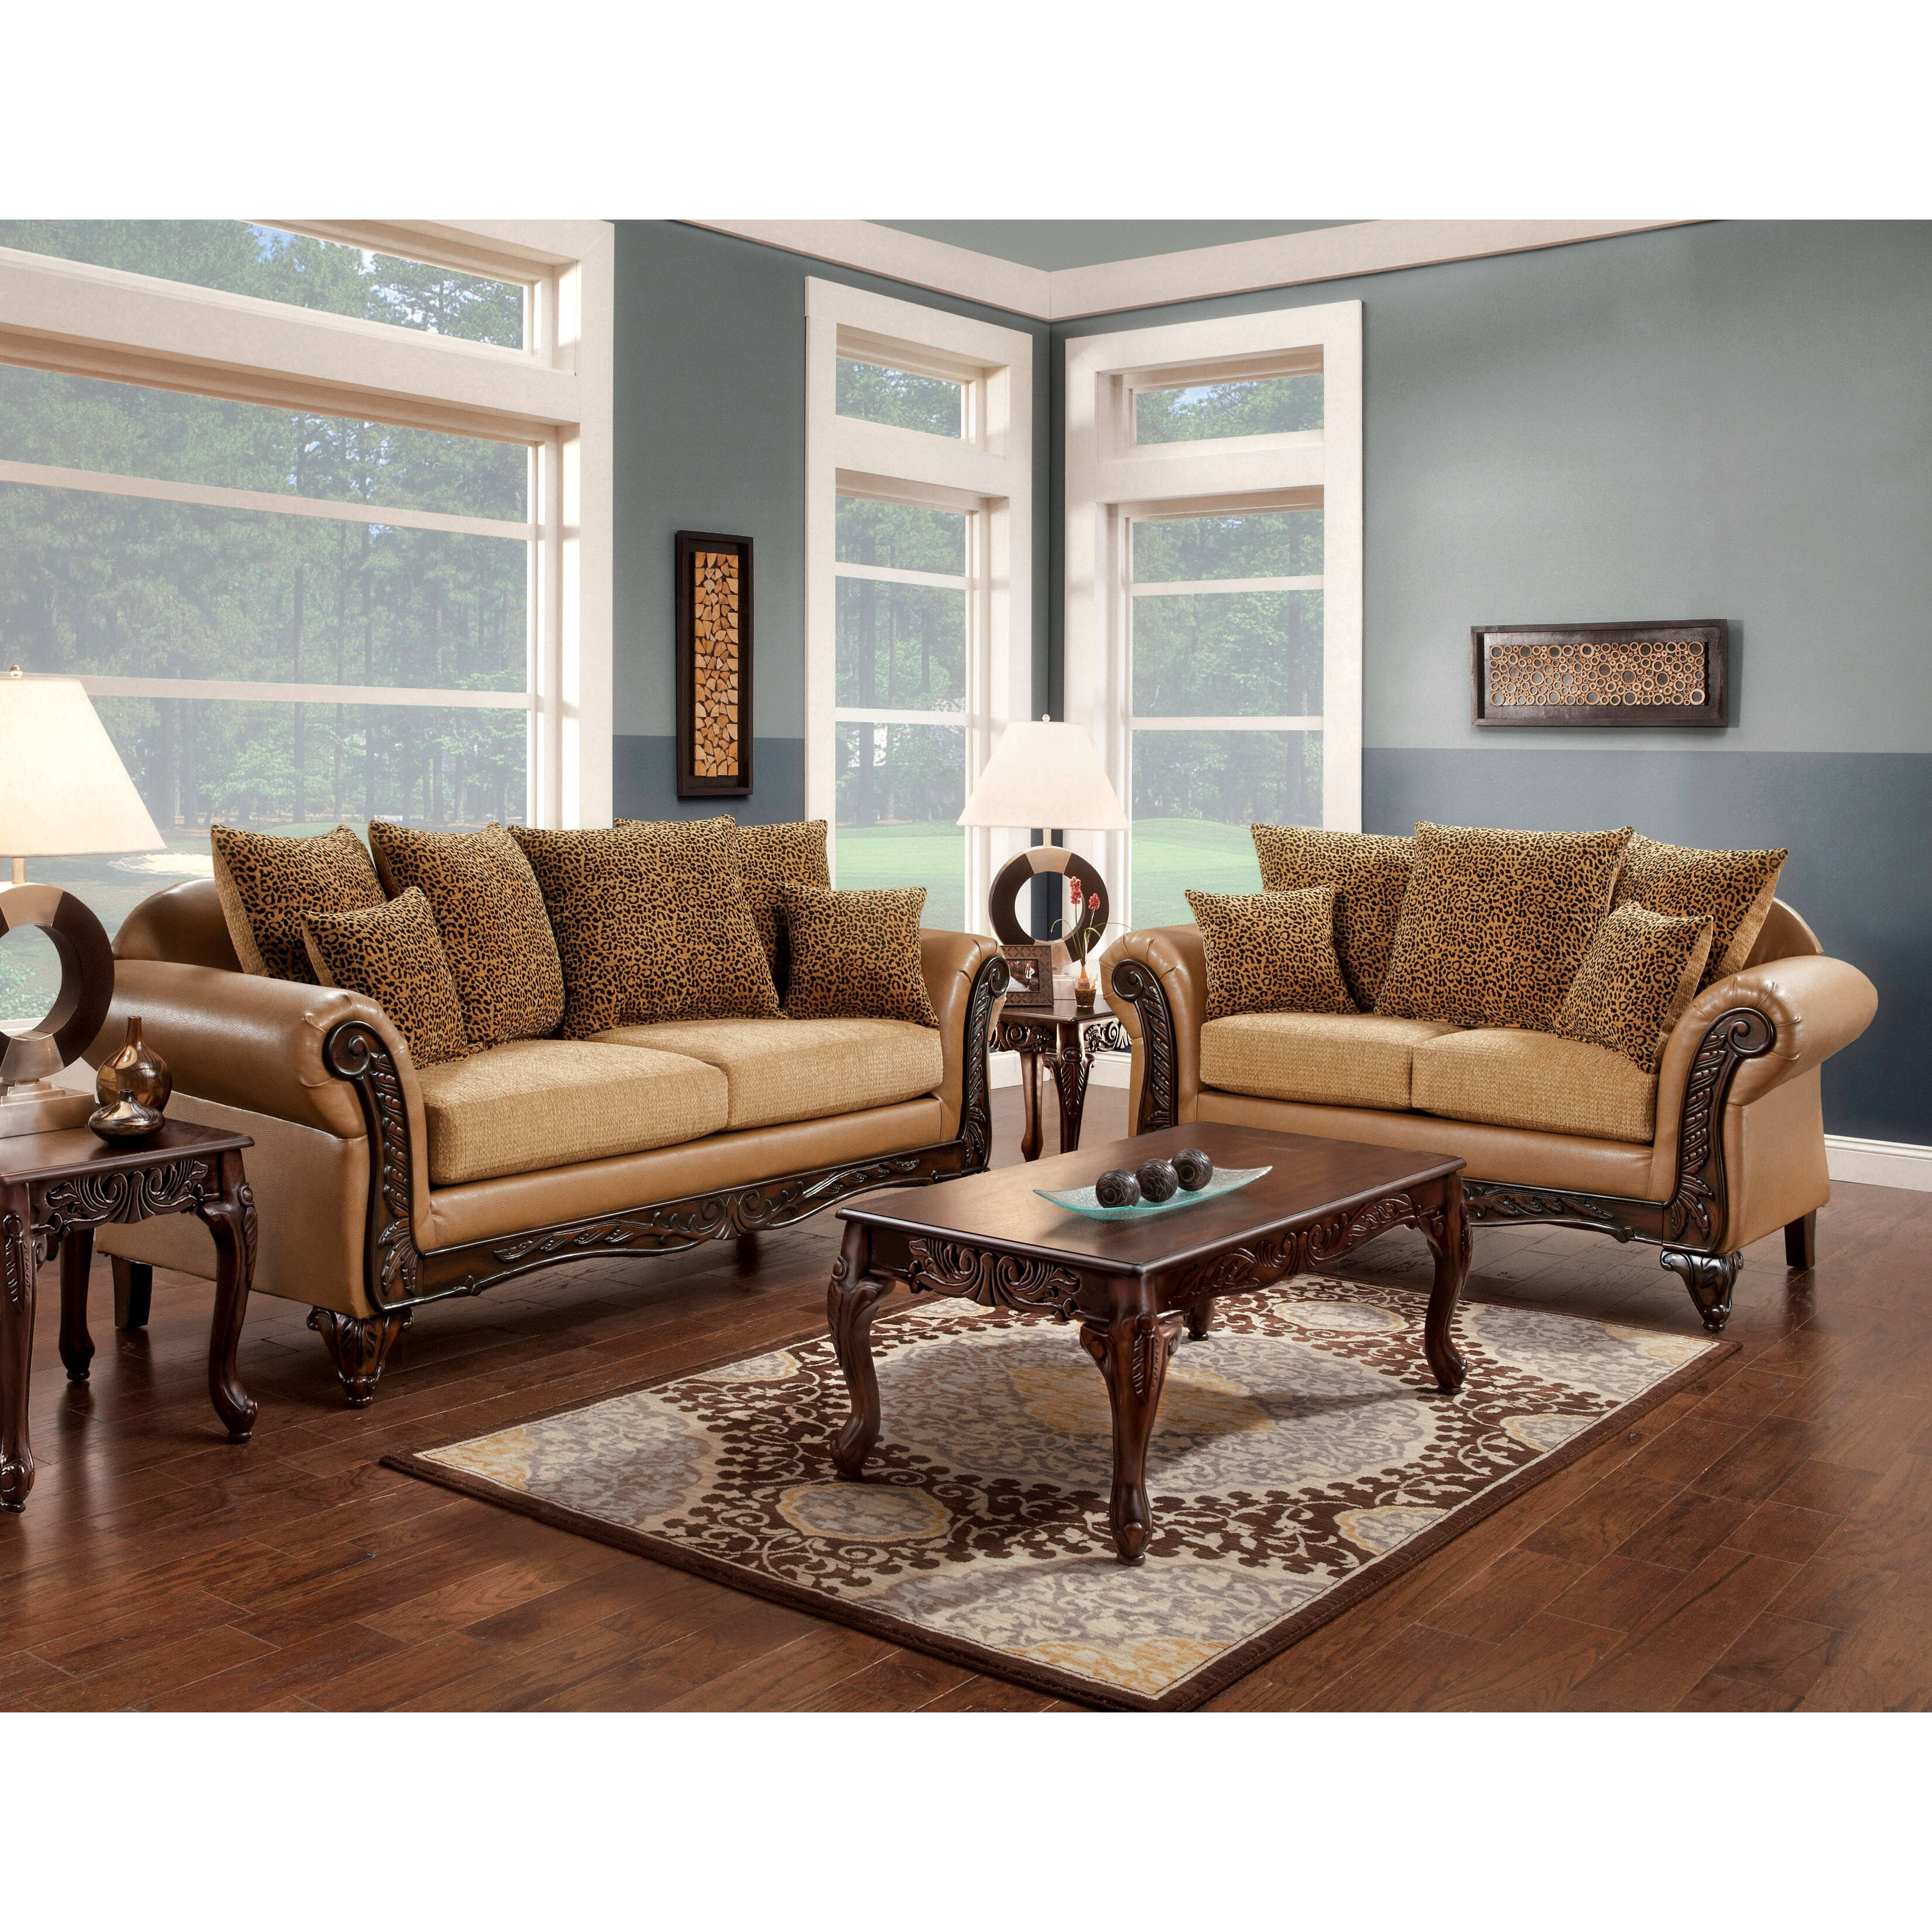 Hokku designs ciara living room collection wayfair supply for Hokku designs living room furniture